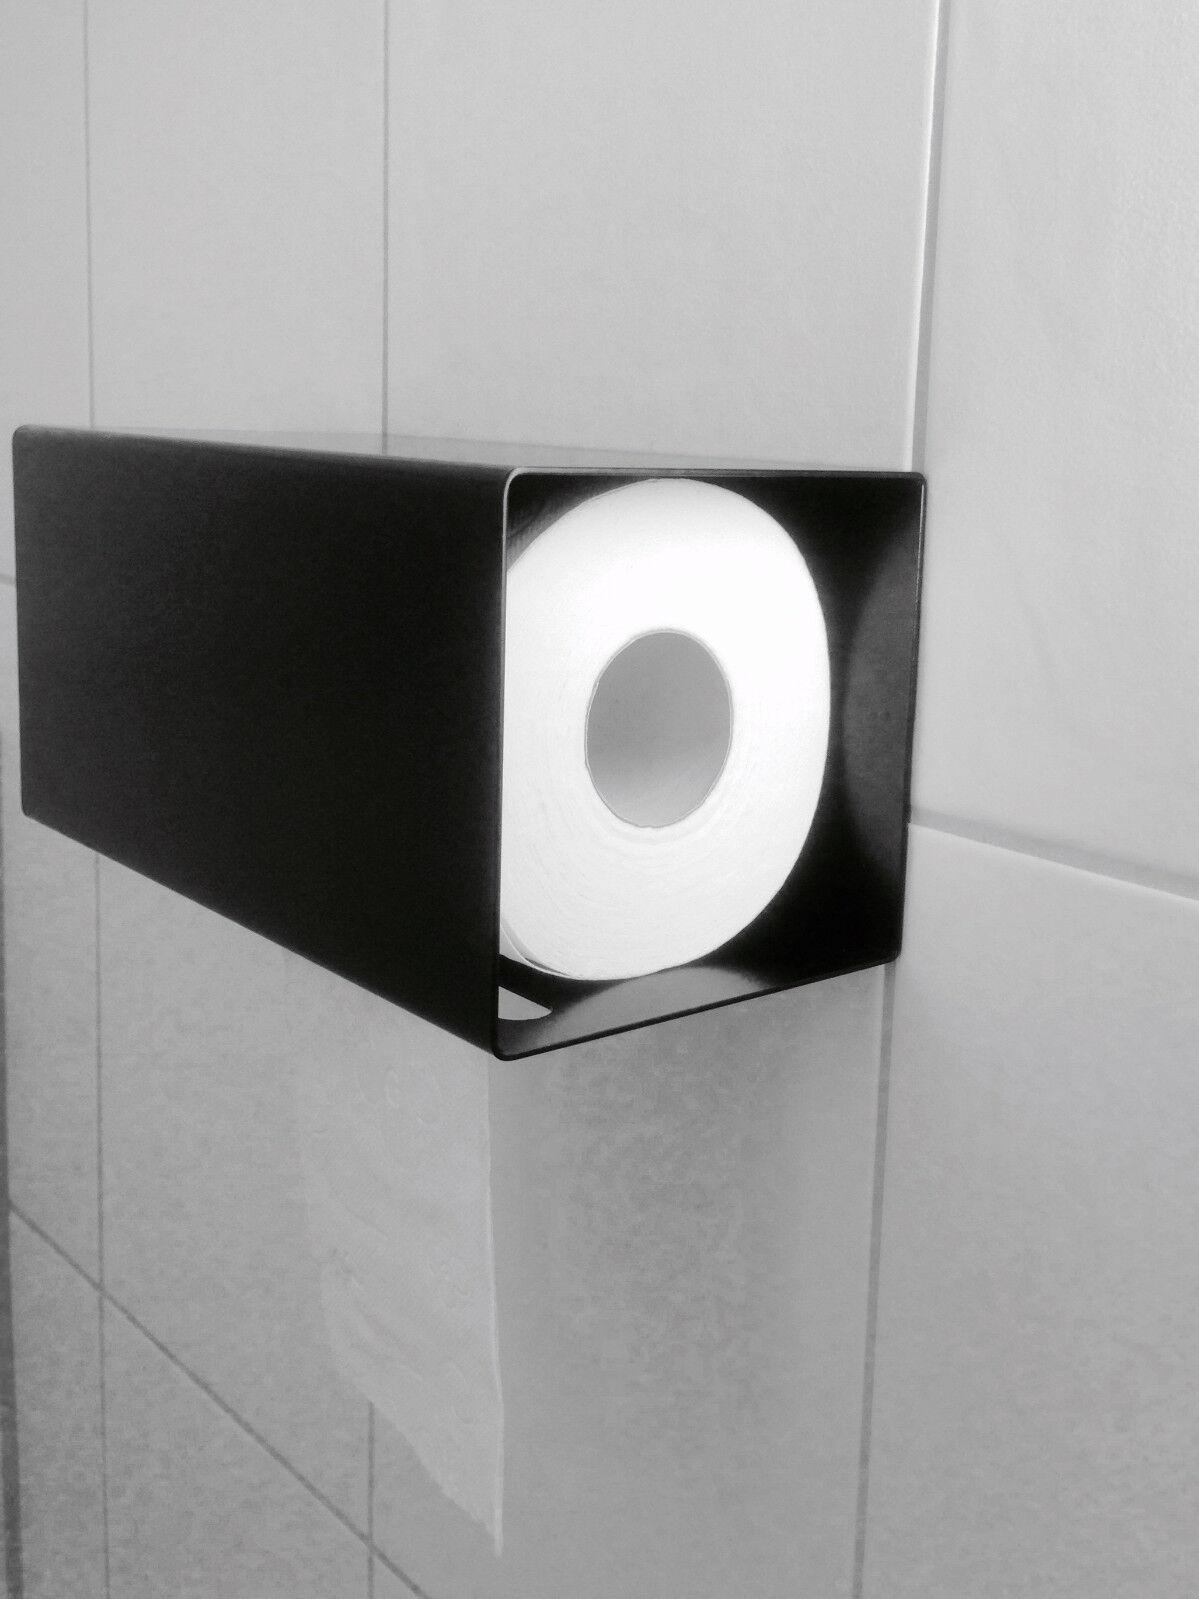 Klopapierhalter Klopapierhalter Klopapierhalter KlGoldllenhalter Designer Toilettenpapierhalter WC Bad schwarz c4a578